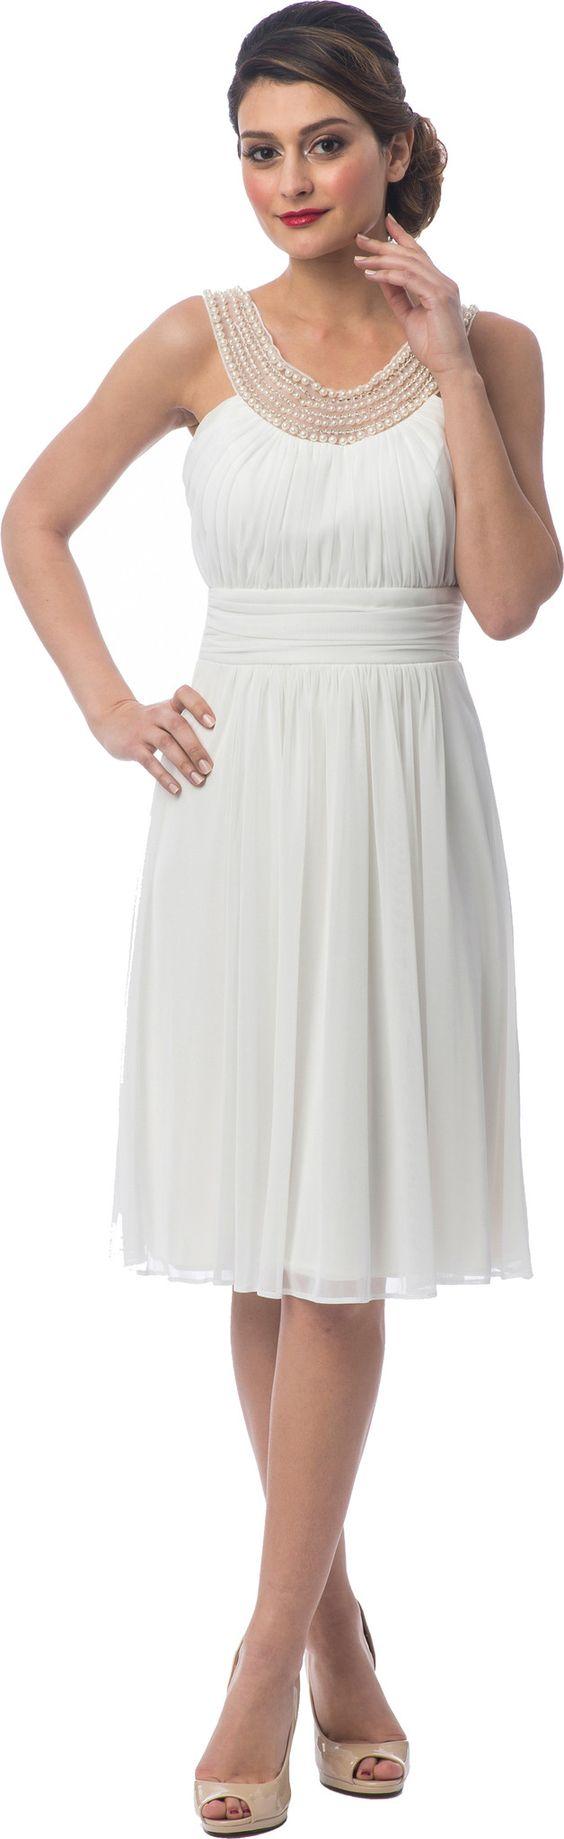 Beaded Bib Knee-Length Bridesmaid Mother of the Bride Dress